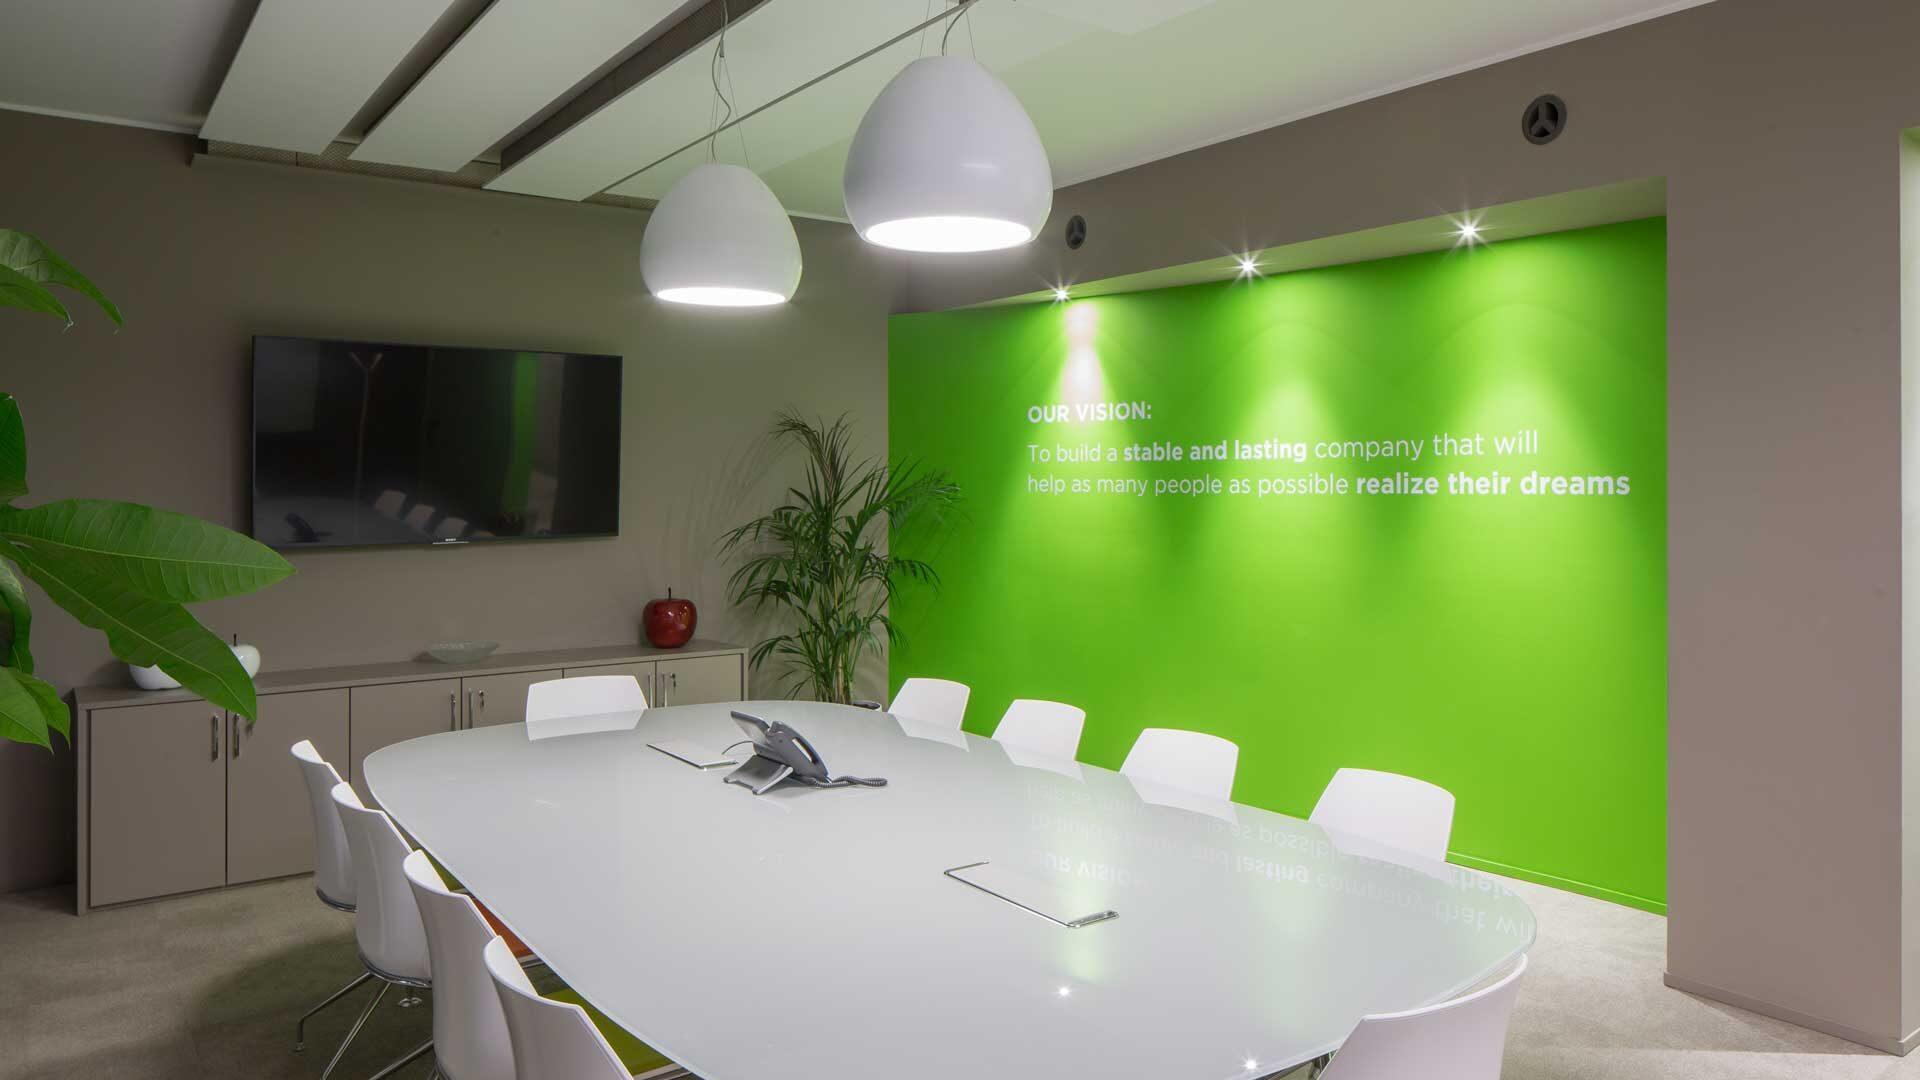 Uffici-per-e-commerce-Juice-Plus-2-Level-Office-Landscape